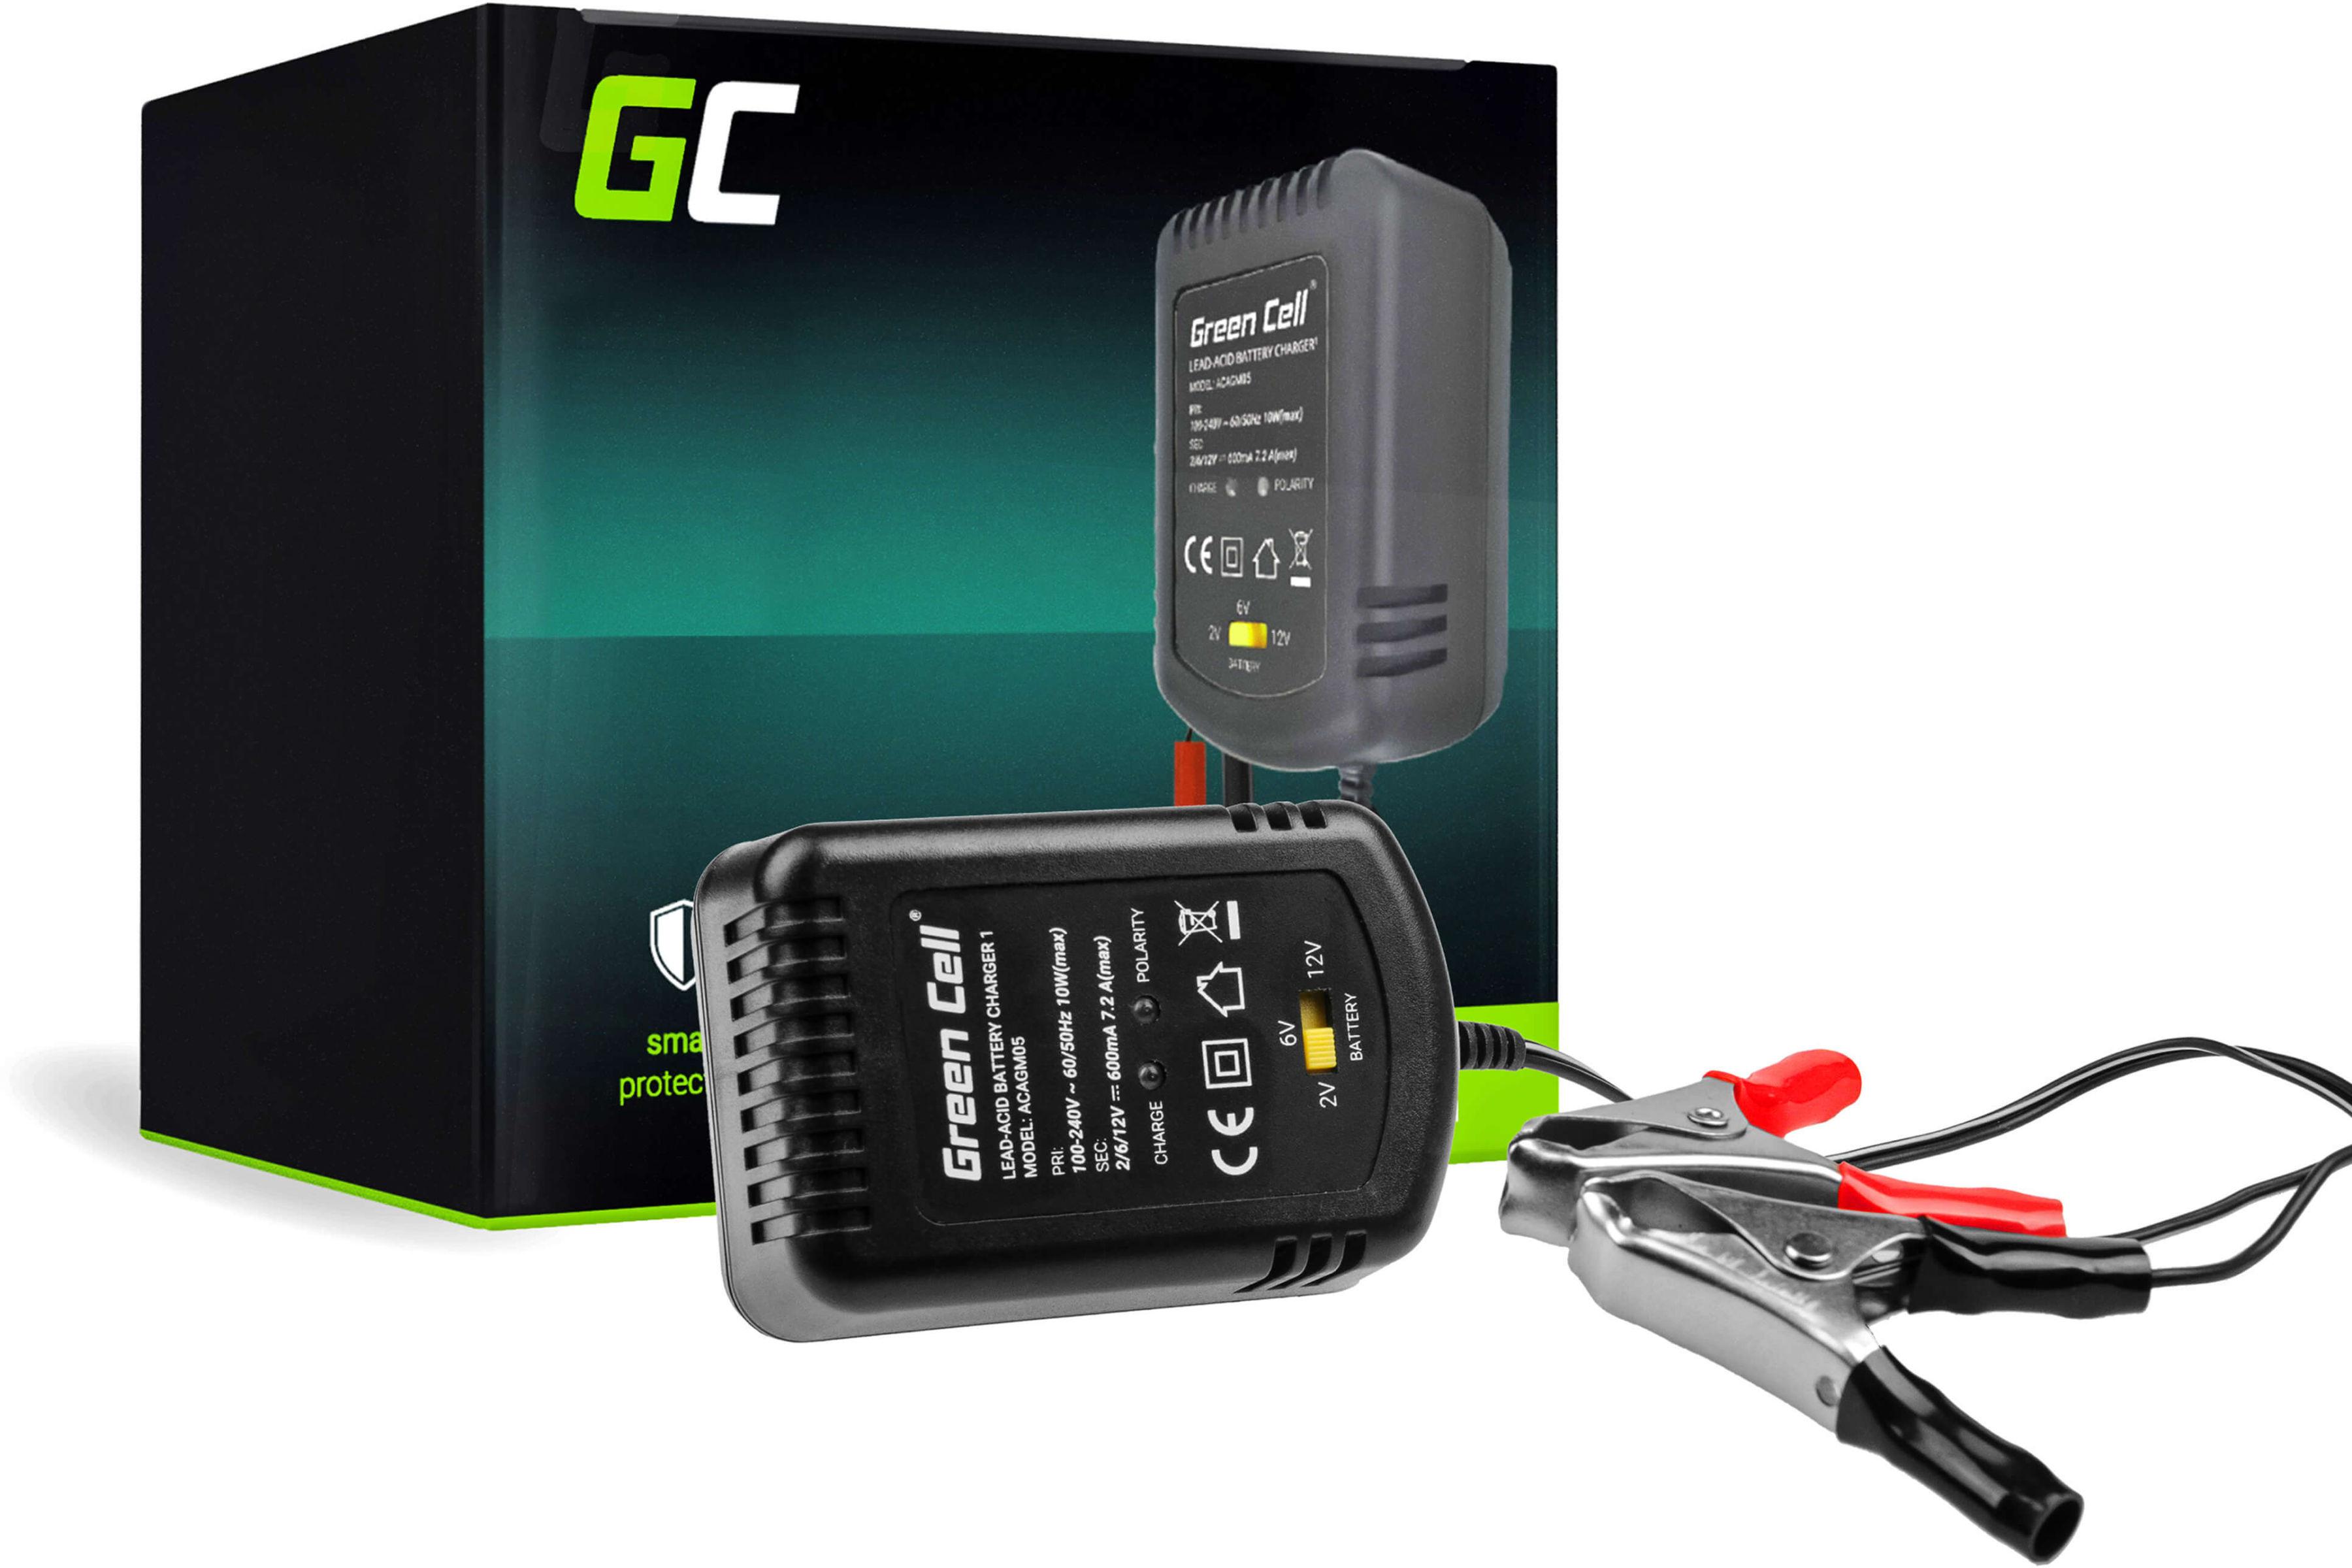 Ładowarka, Prostownik Green Cell do akumulatorów 2V / 6V / 12V (0.6A)